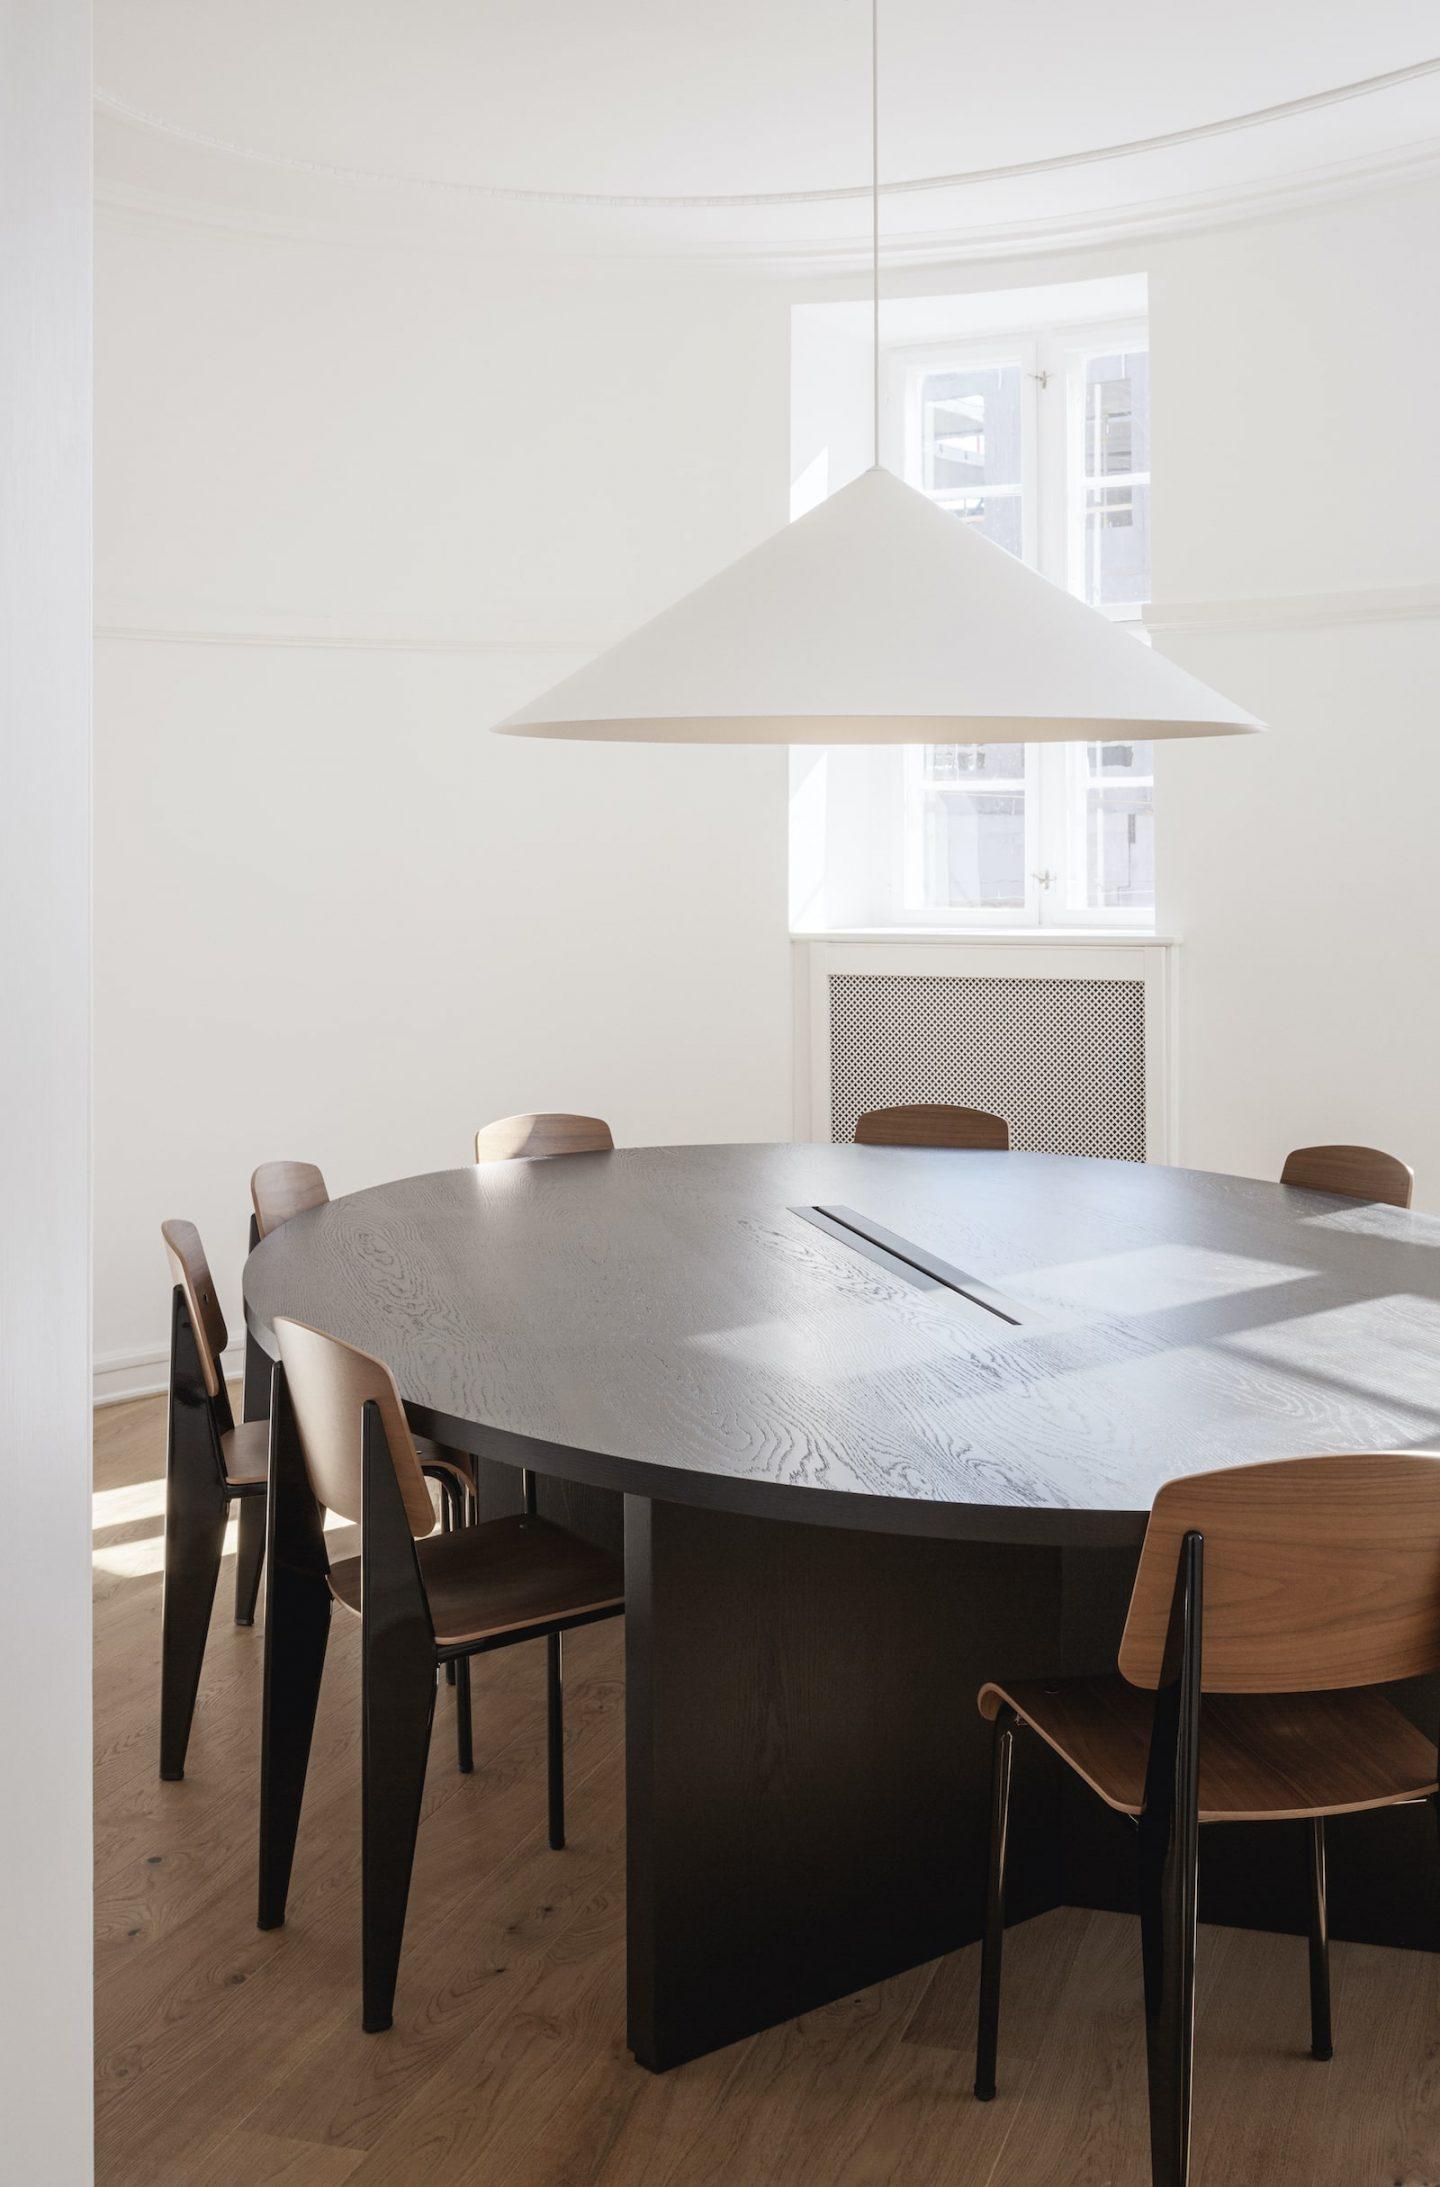 IGNANT-Design-Aspekt-Office-018